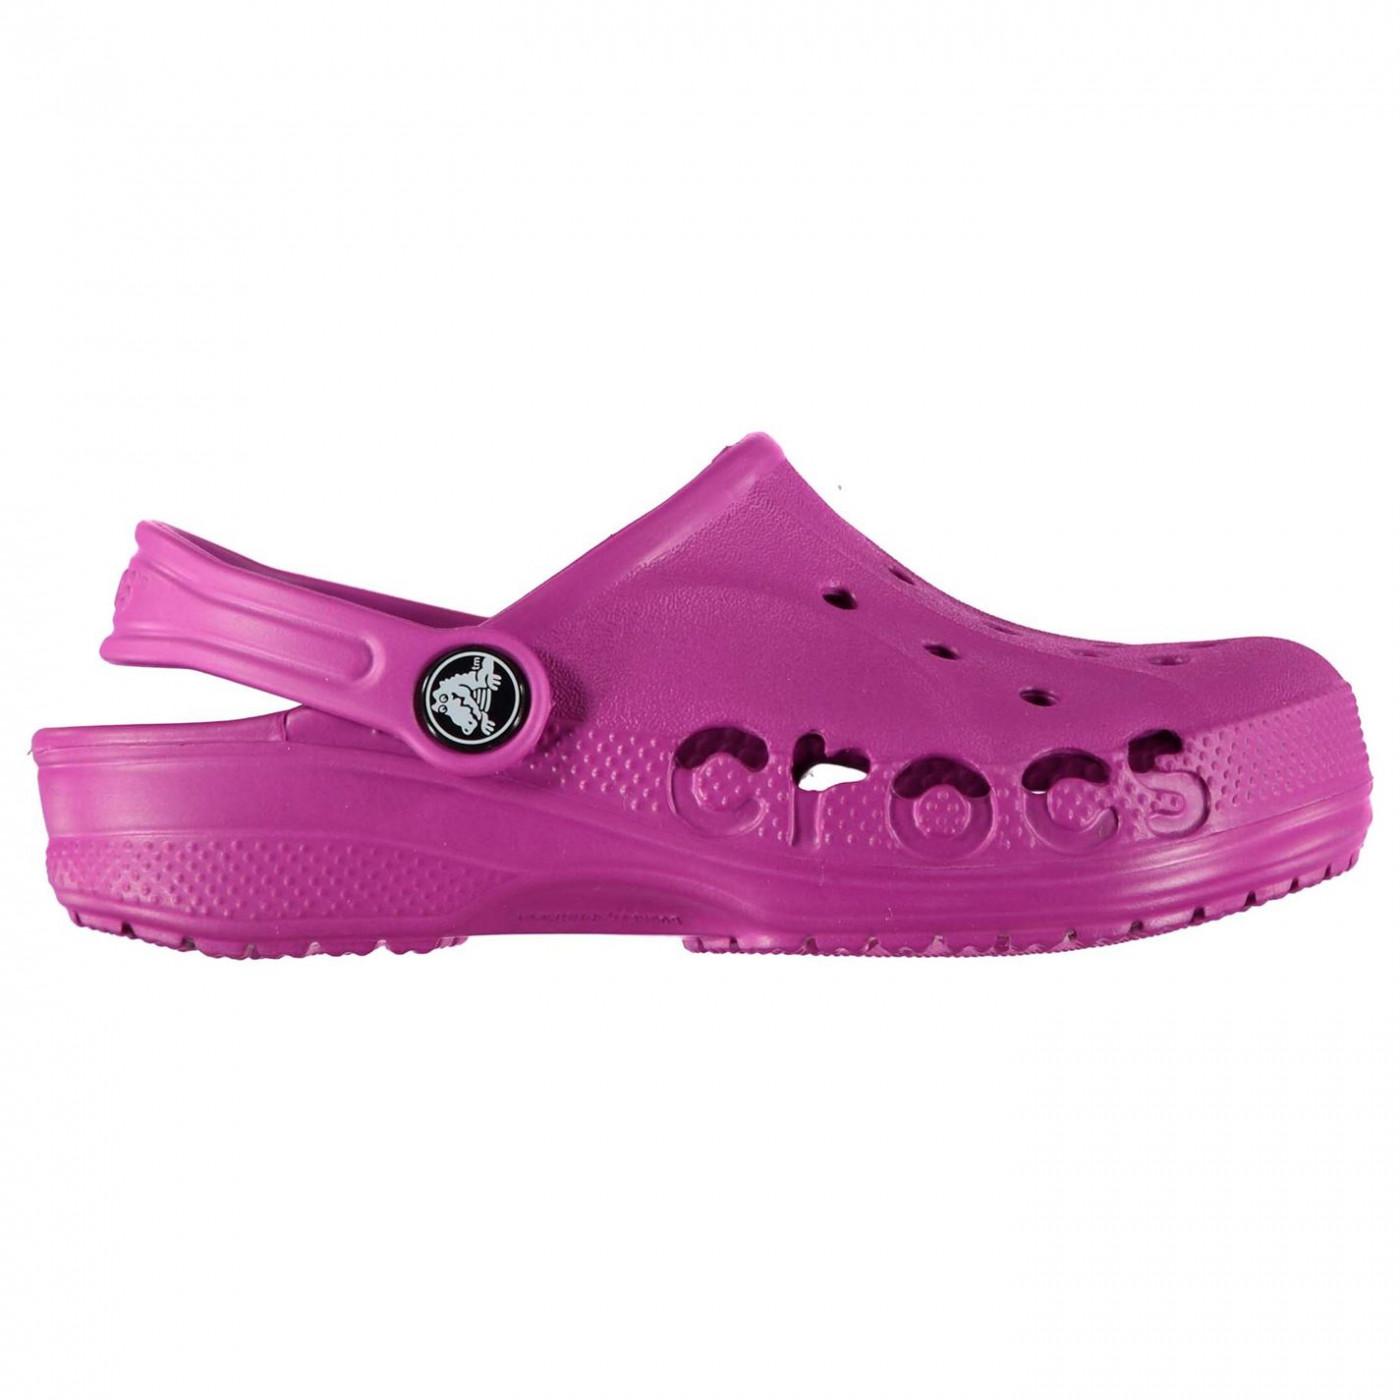 Crocs Baya Clog Inf83